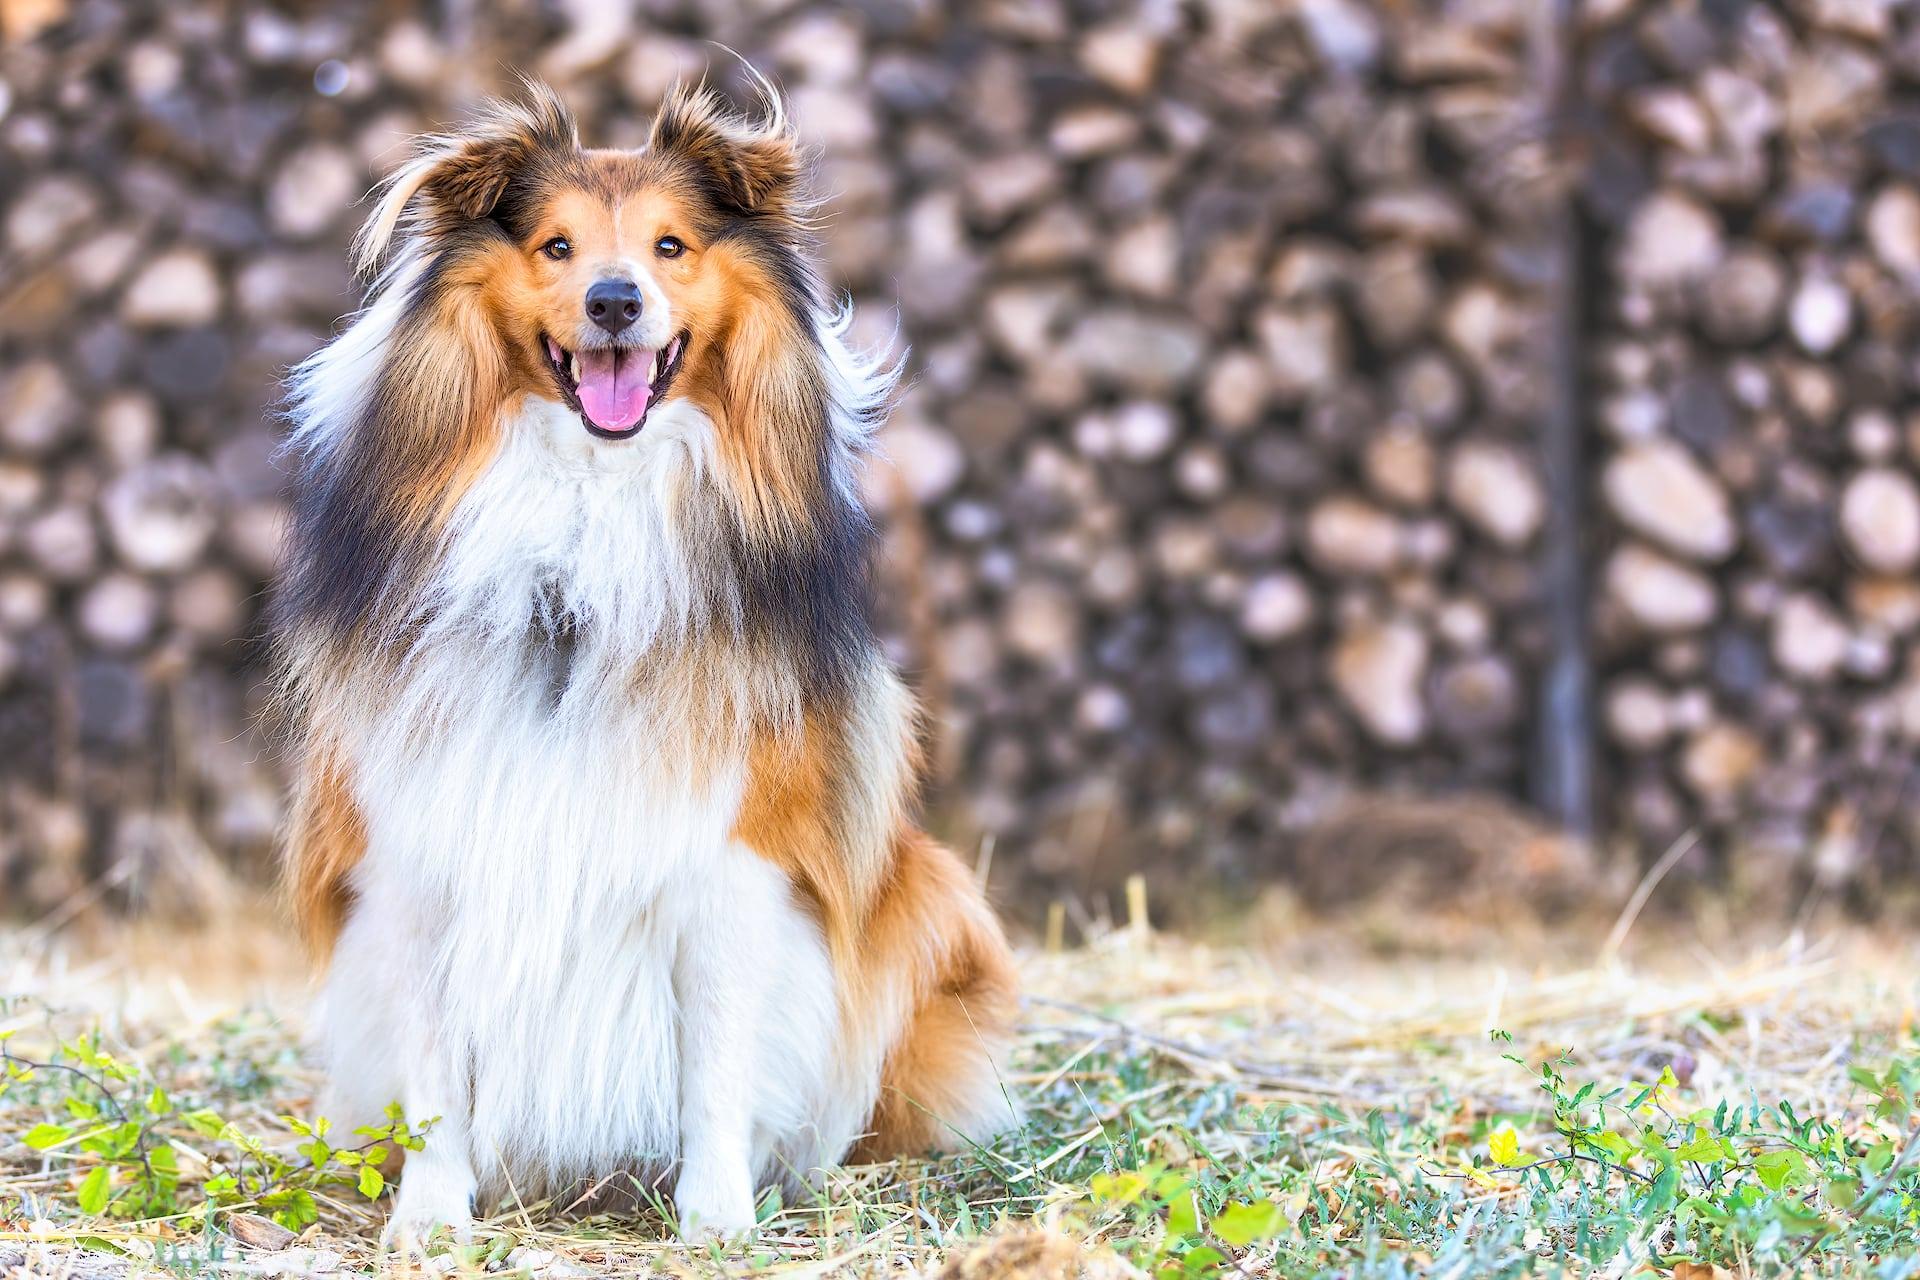 Berger Des Shetland in Vineyard pet portrait